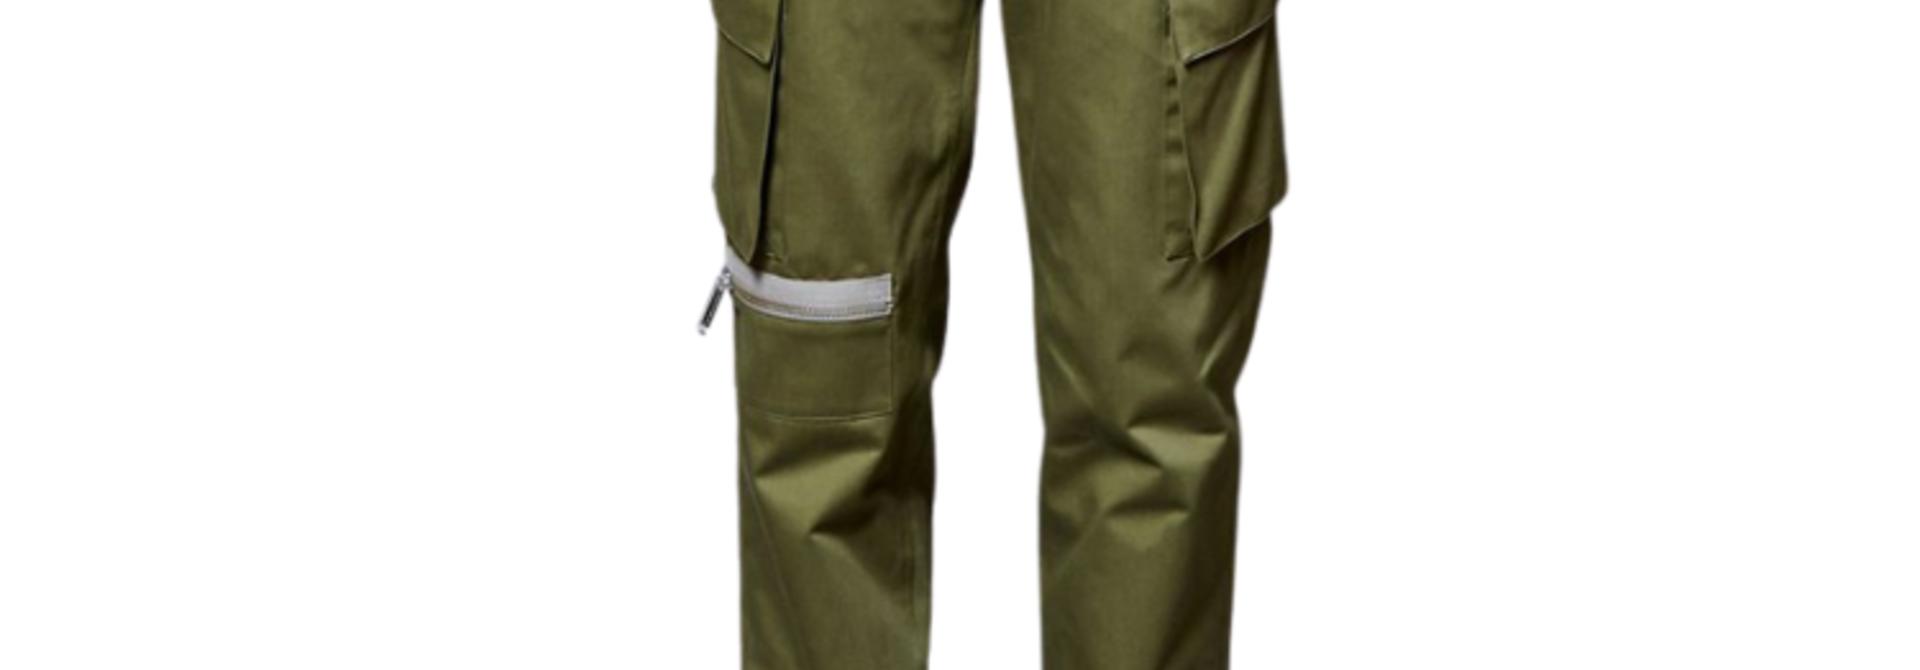 PSNYC CARGO PANT GREEN